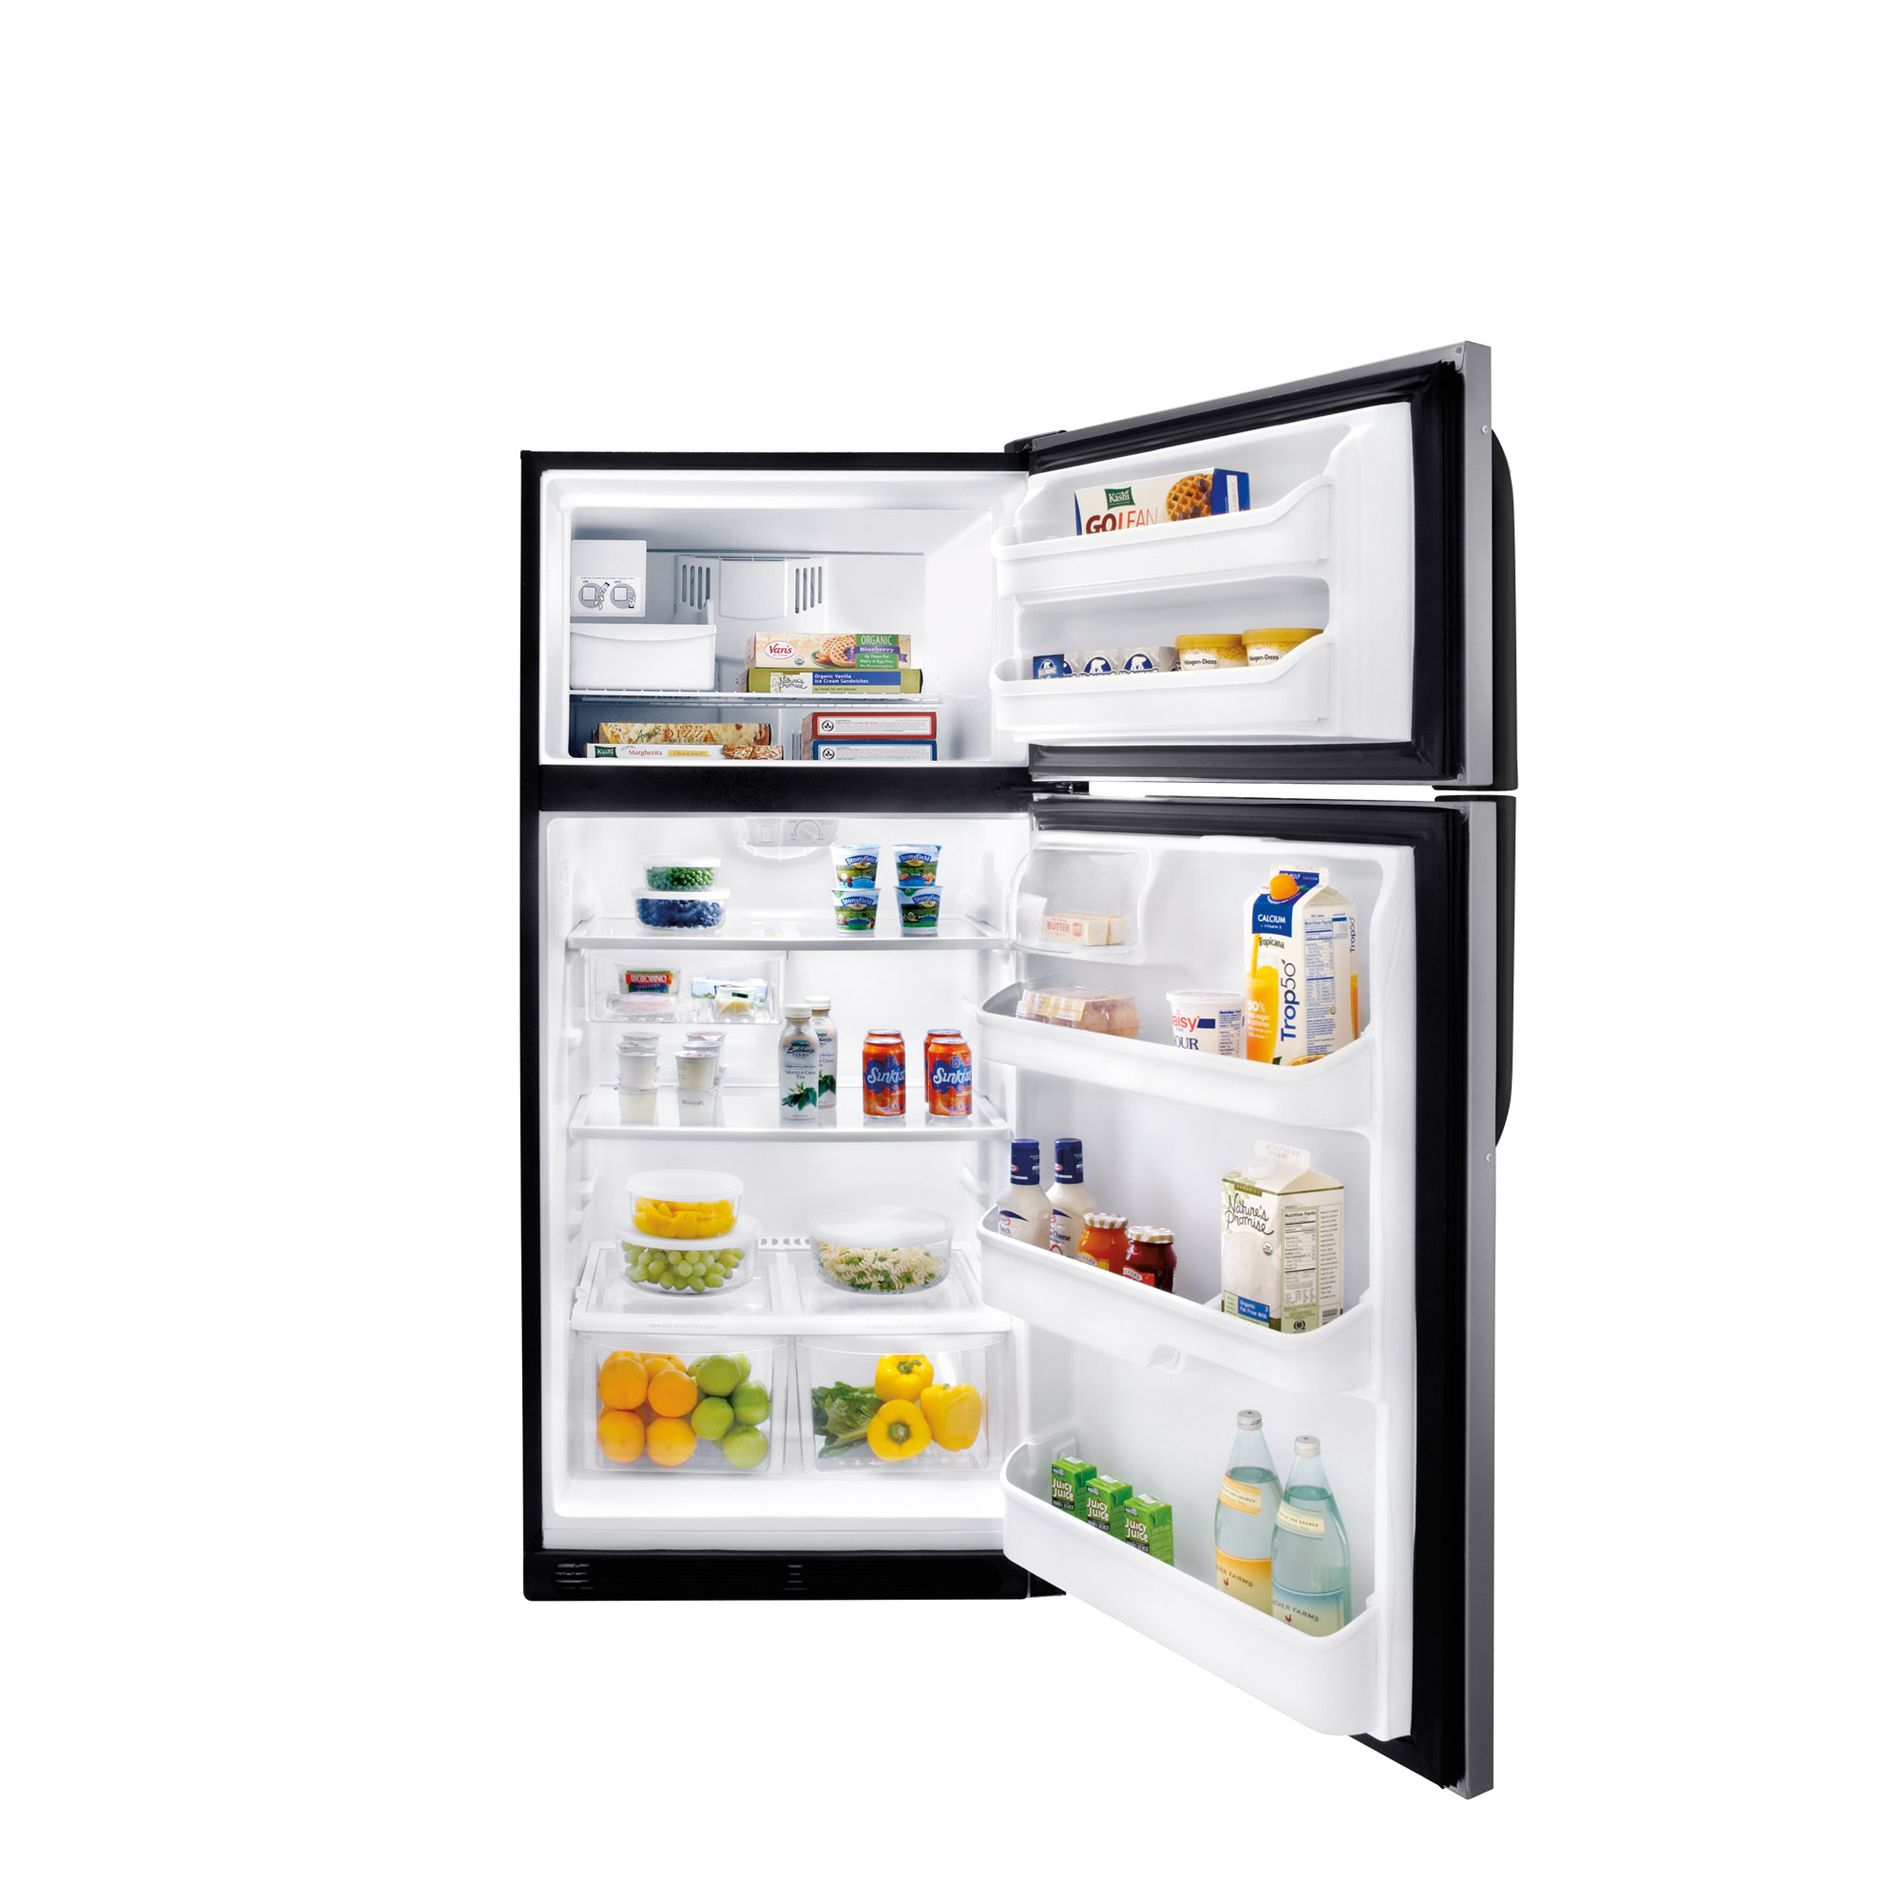 Kenmore 18.2 cu. ft. Top-Freezer Refrigerator - Stainless Look